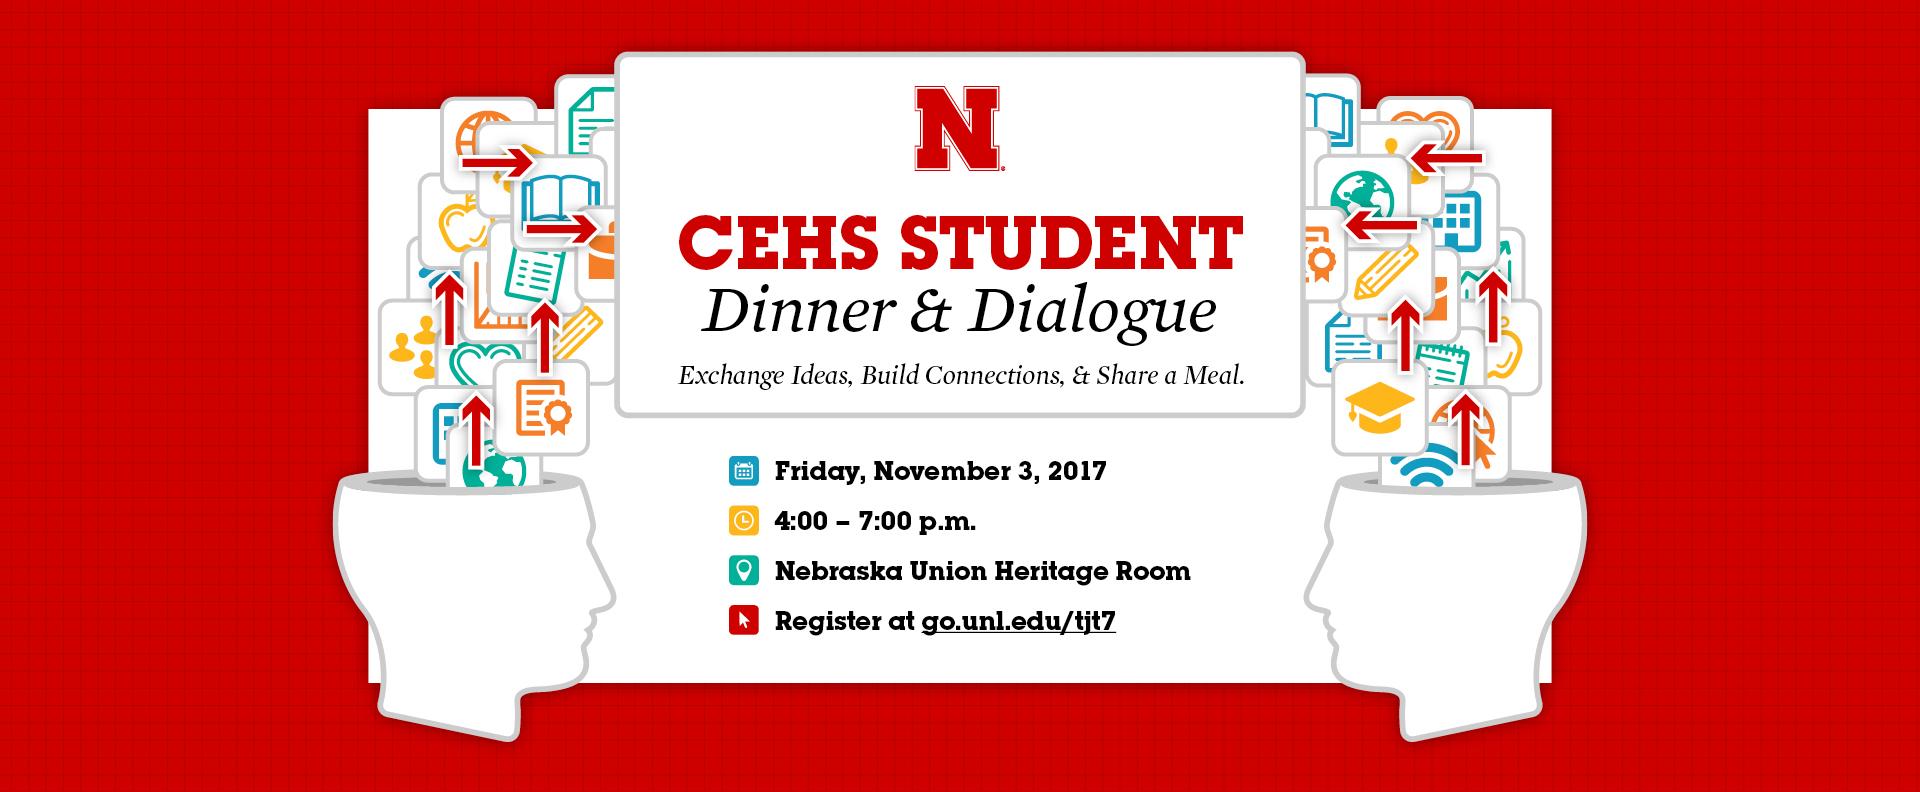 CEHS Dinner & Dialogue scheduled for Nov. 3.